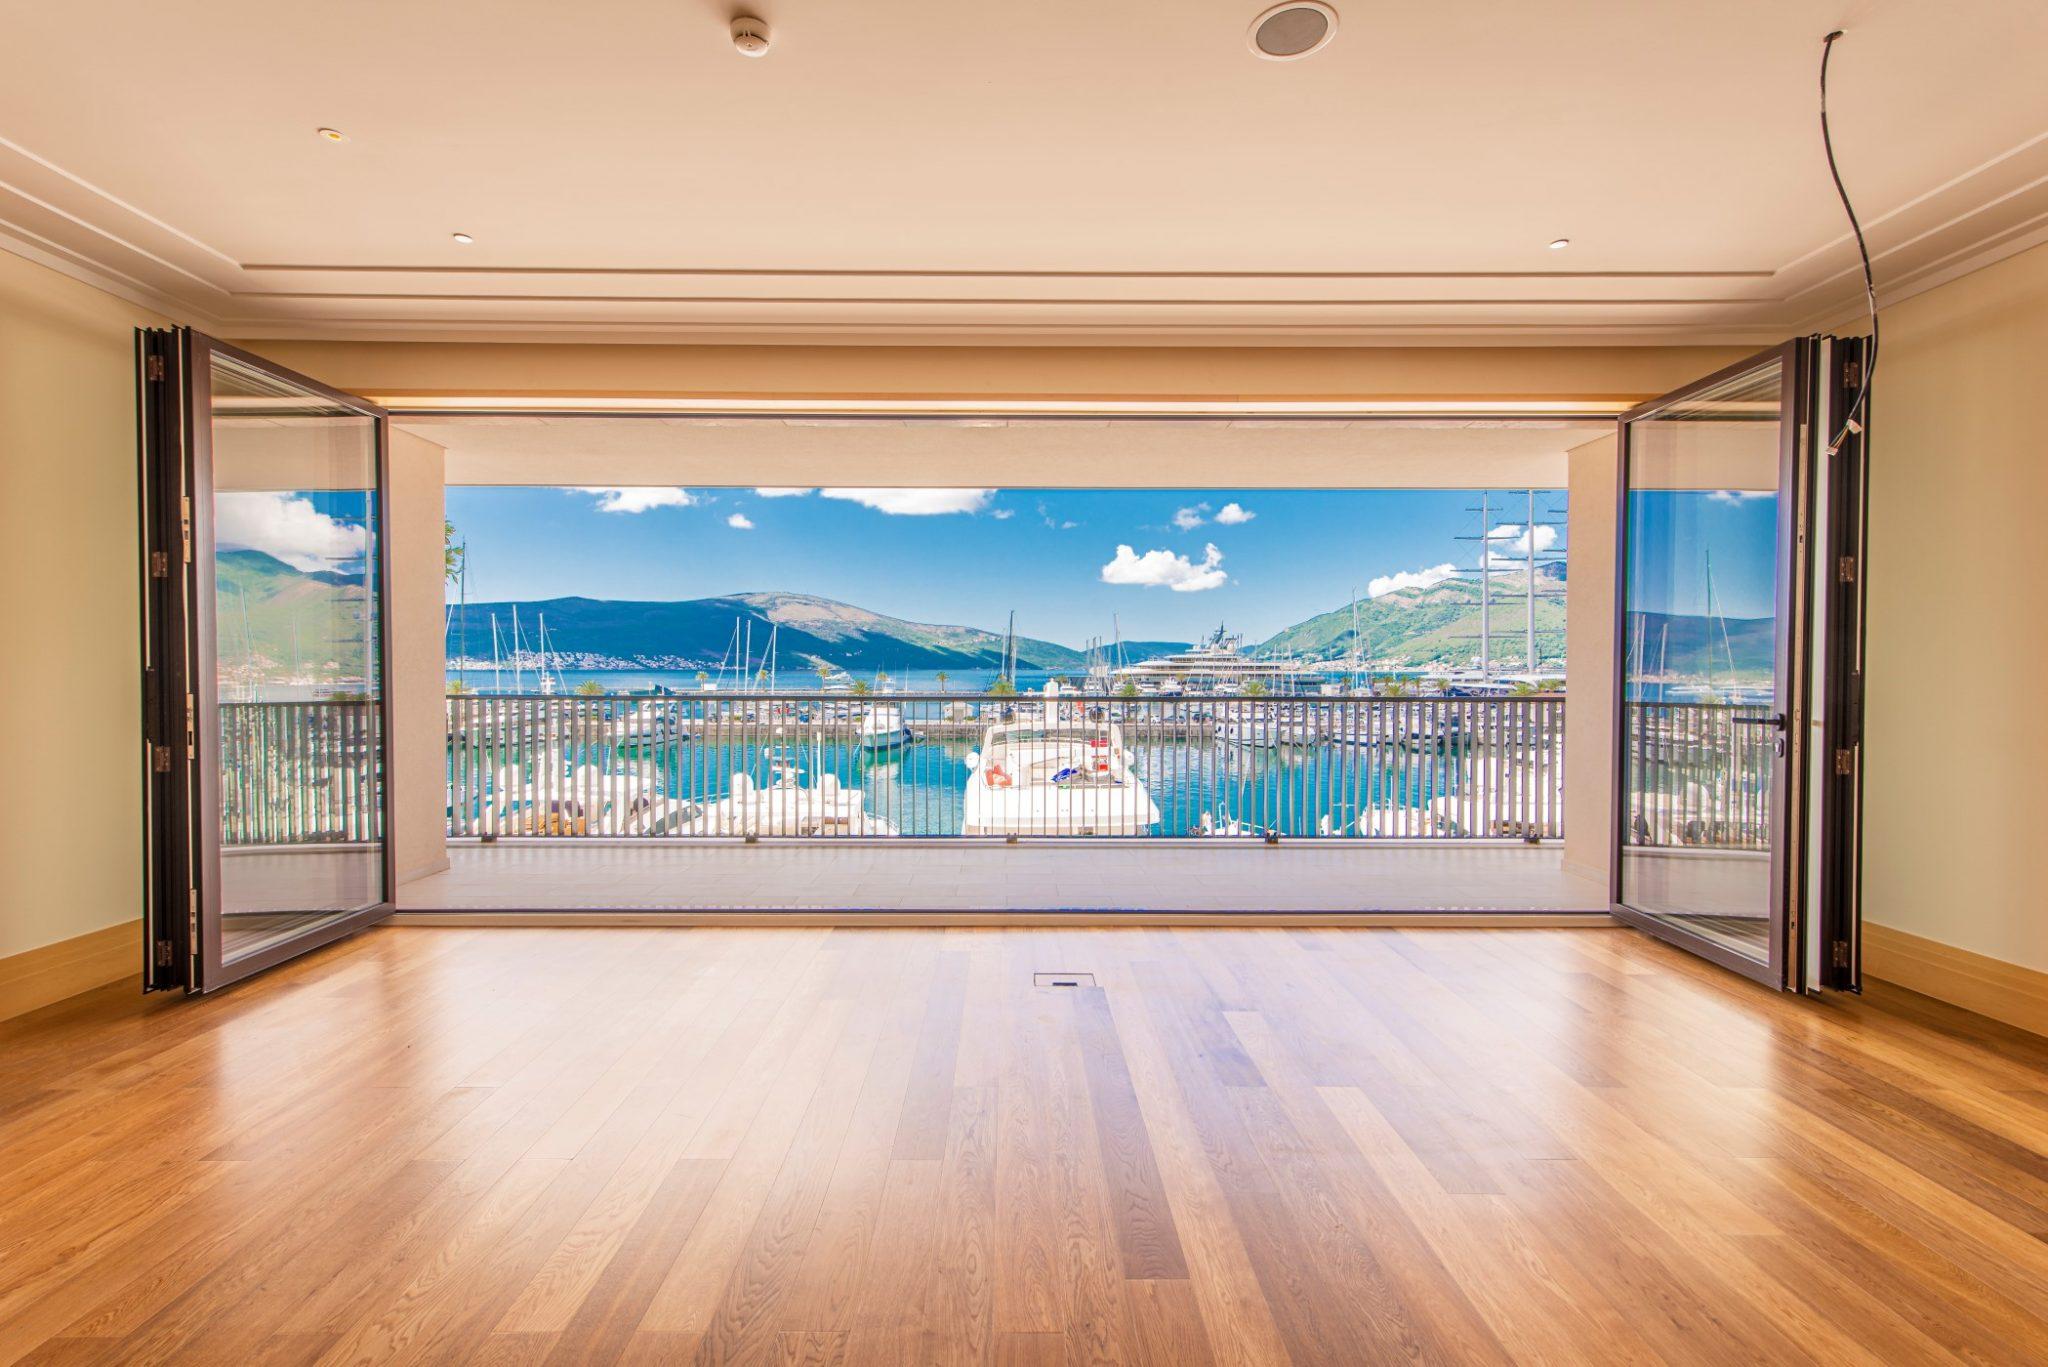 Tivat, Porto Montenegro – dvosoban apartman na prvoj liniji sa panoramskim pogledom na more